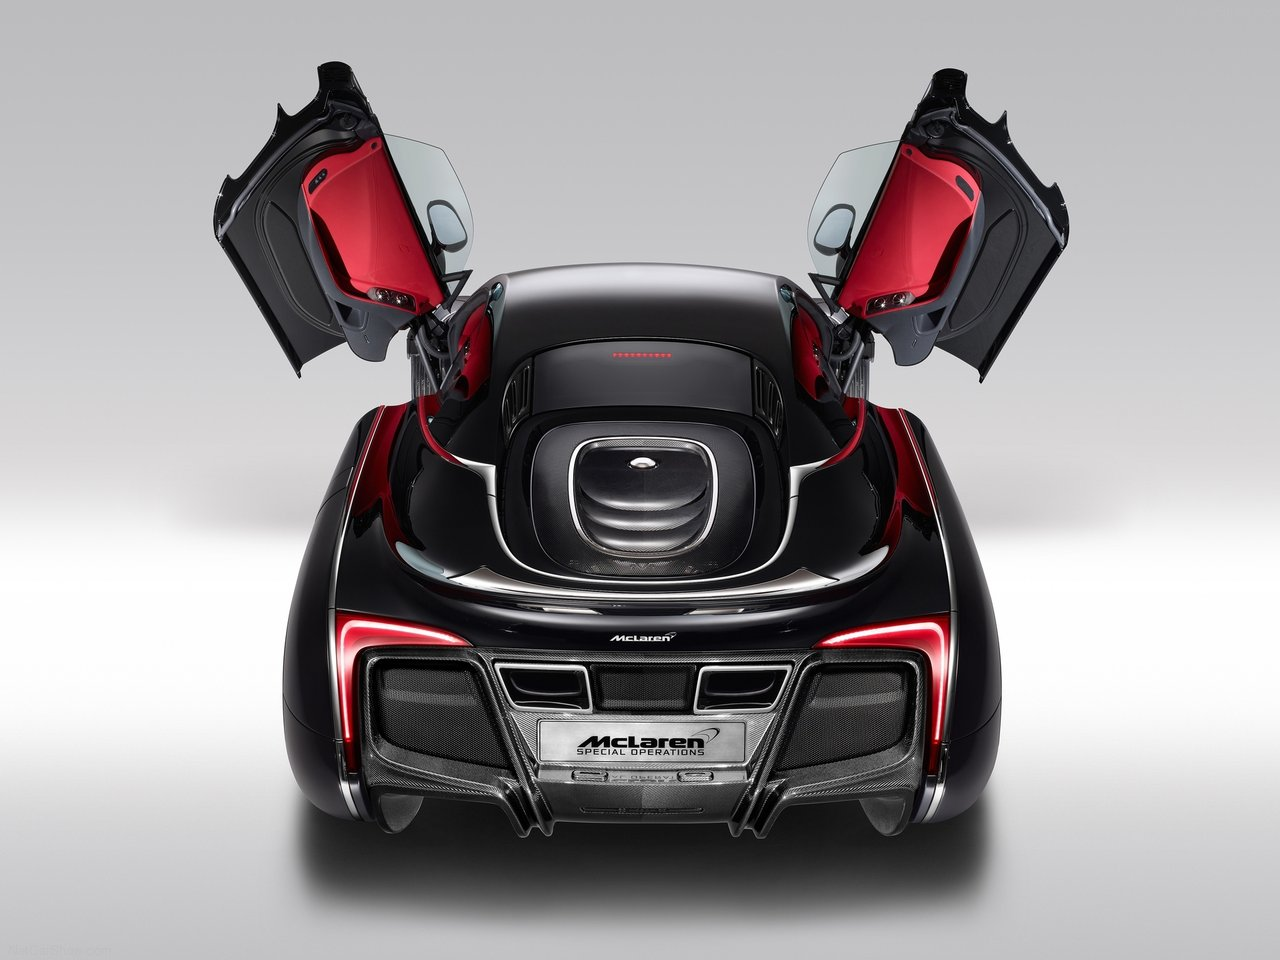 McLaren X-1 MSO Concept 2012 McLaren-X-1_Concept-2012-1280-14